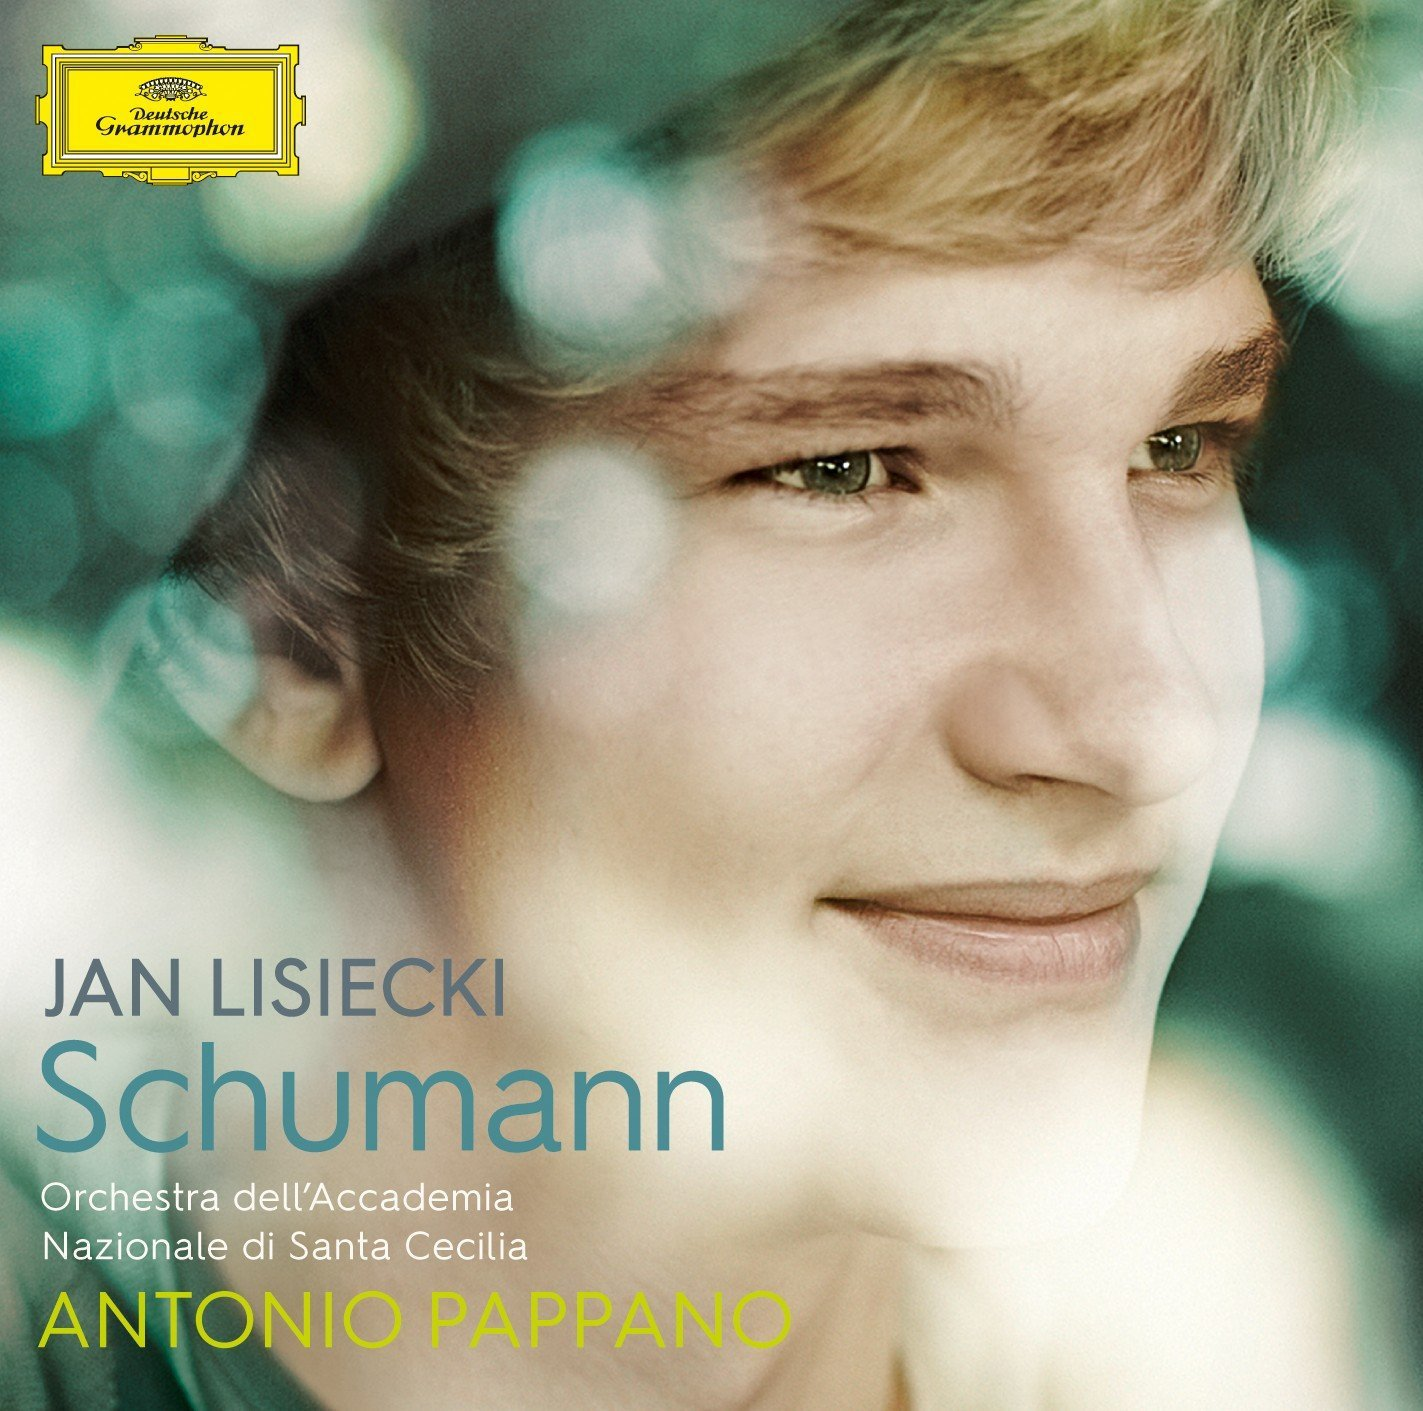 CD : JAN LISIECKI - Schumann (CD)